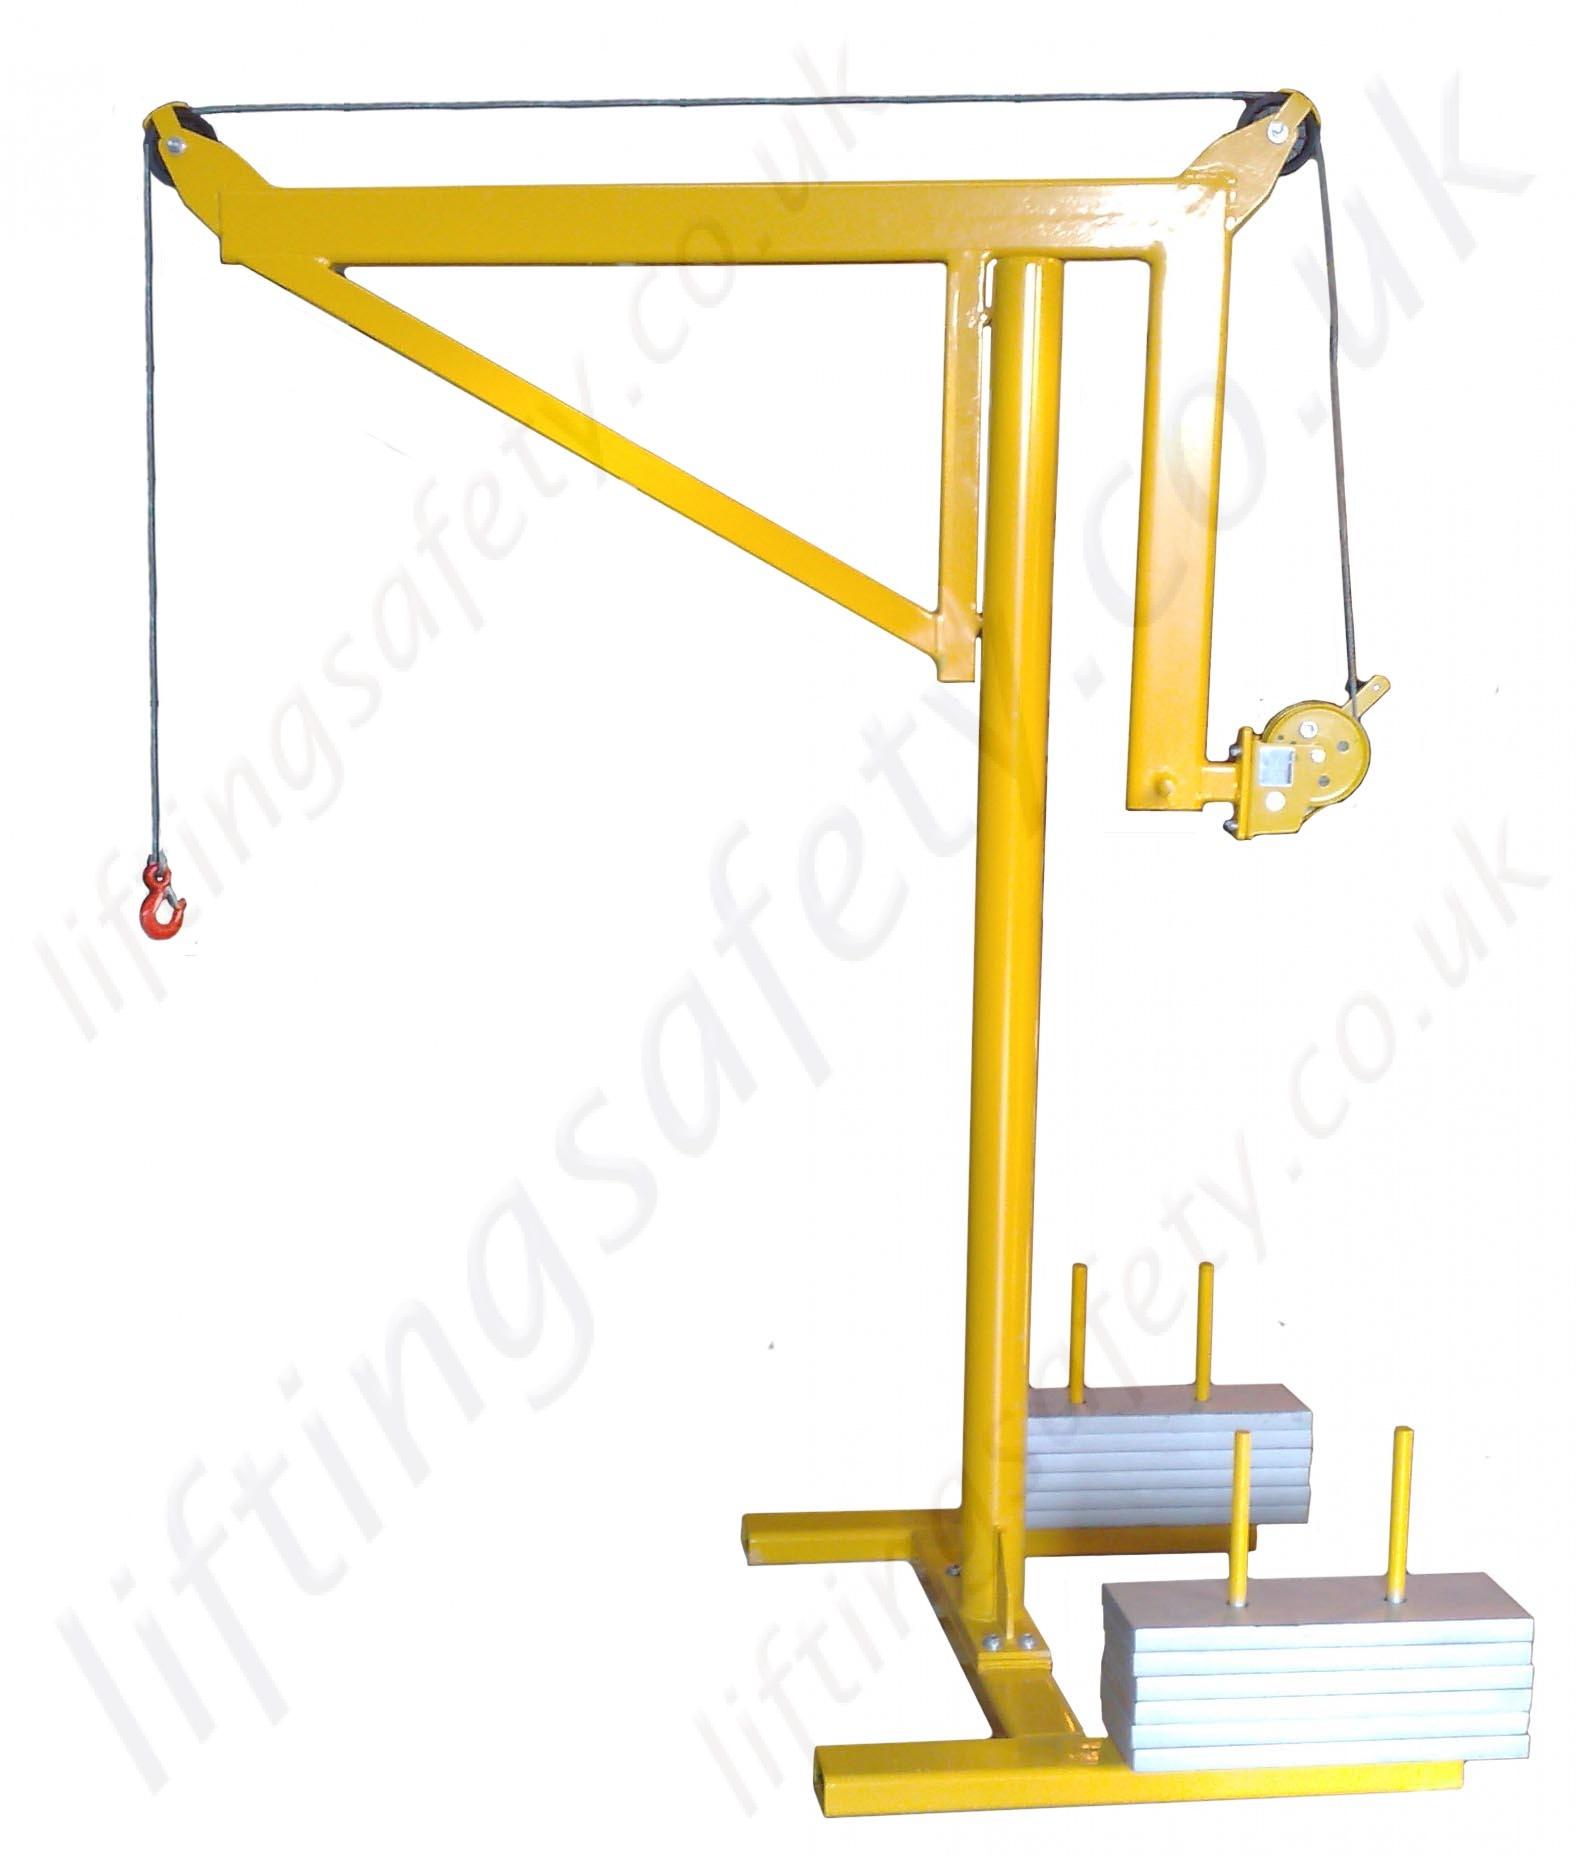 p&h hevi lift hoist manual